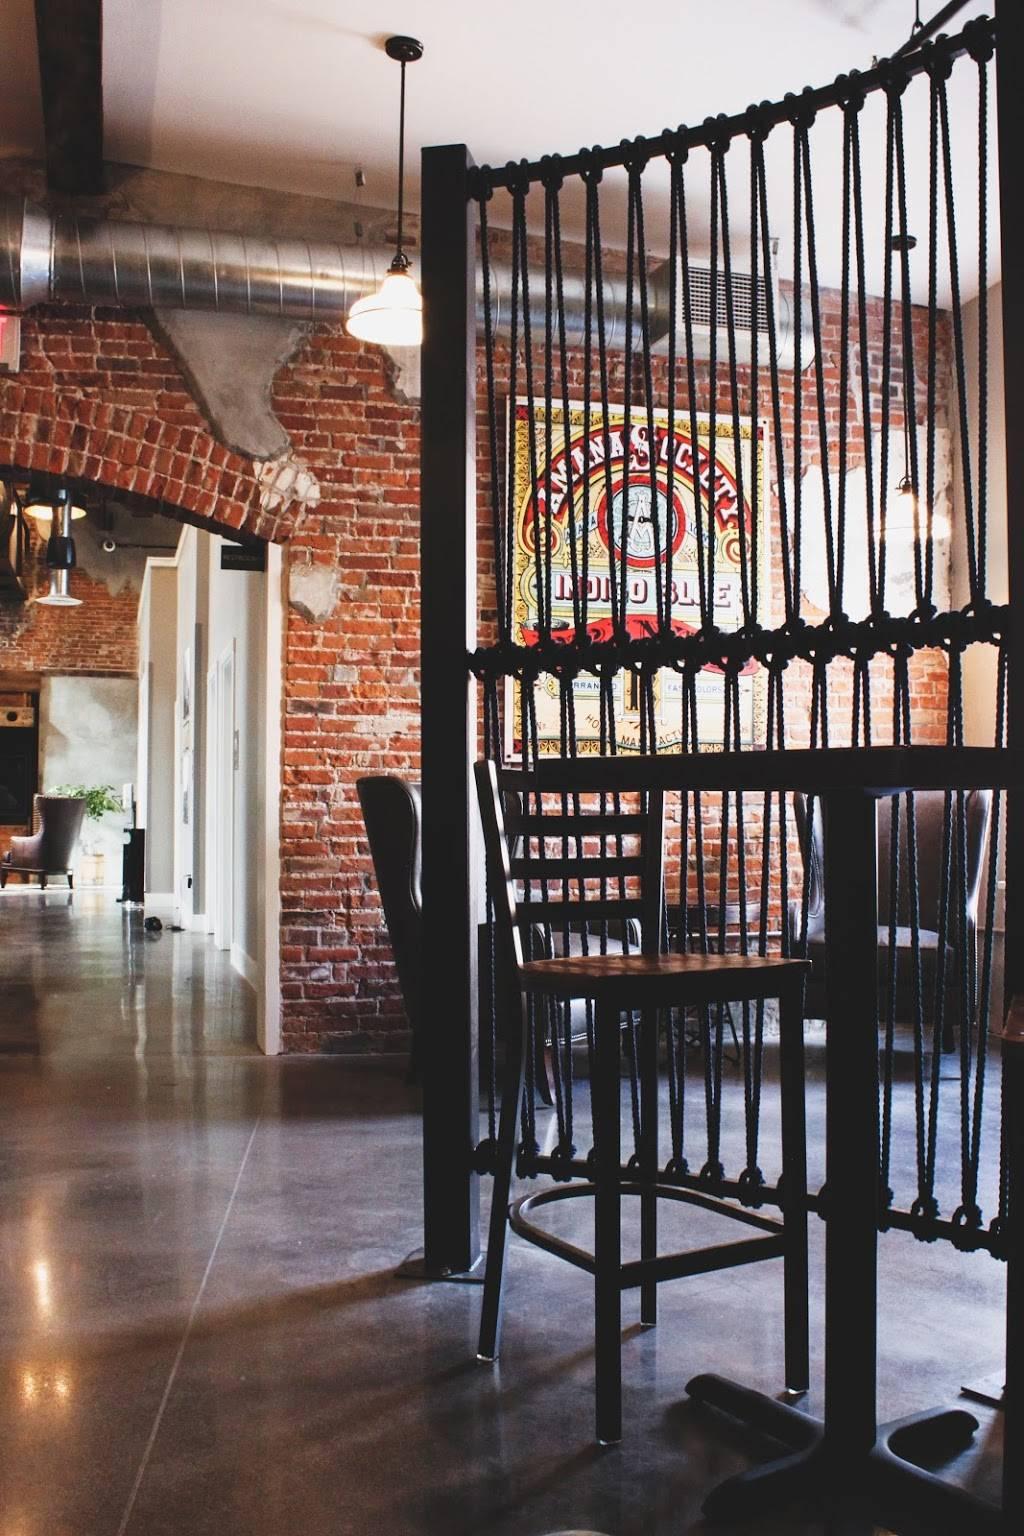 Indigo Room | restaurant | 800 48th Ave, Amana, IA 52203, USA | 3198385015 OR +1 319-838-5015